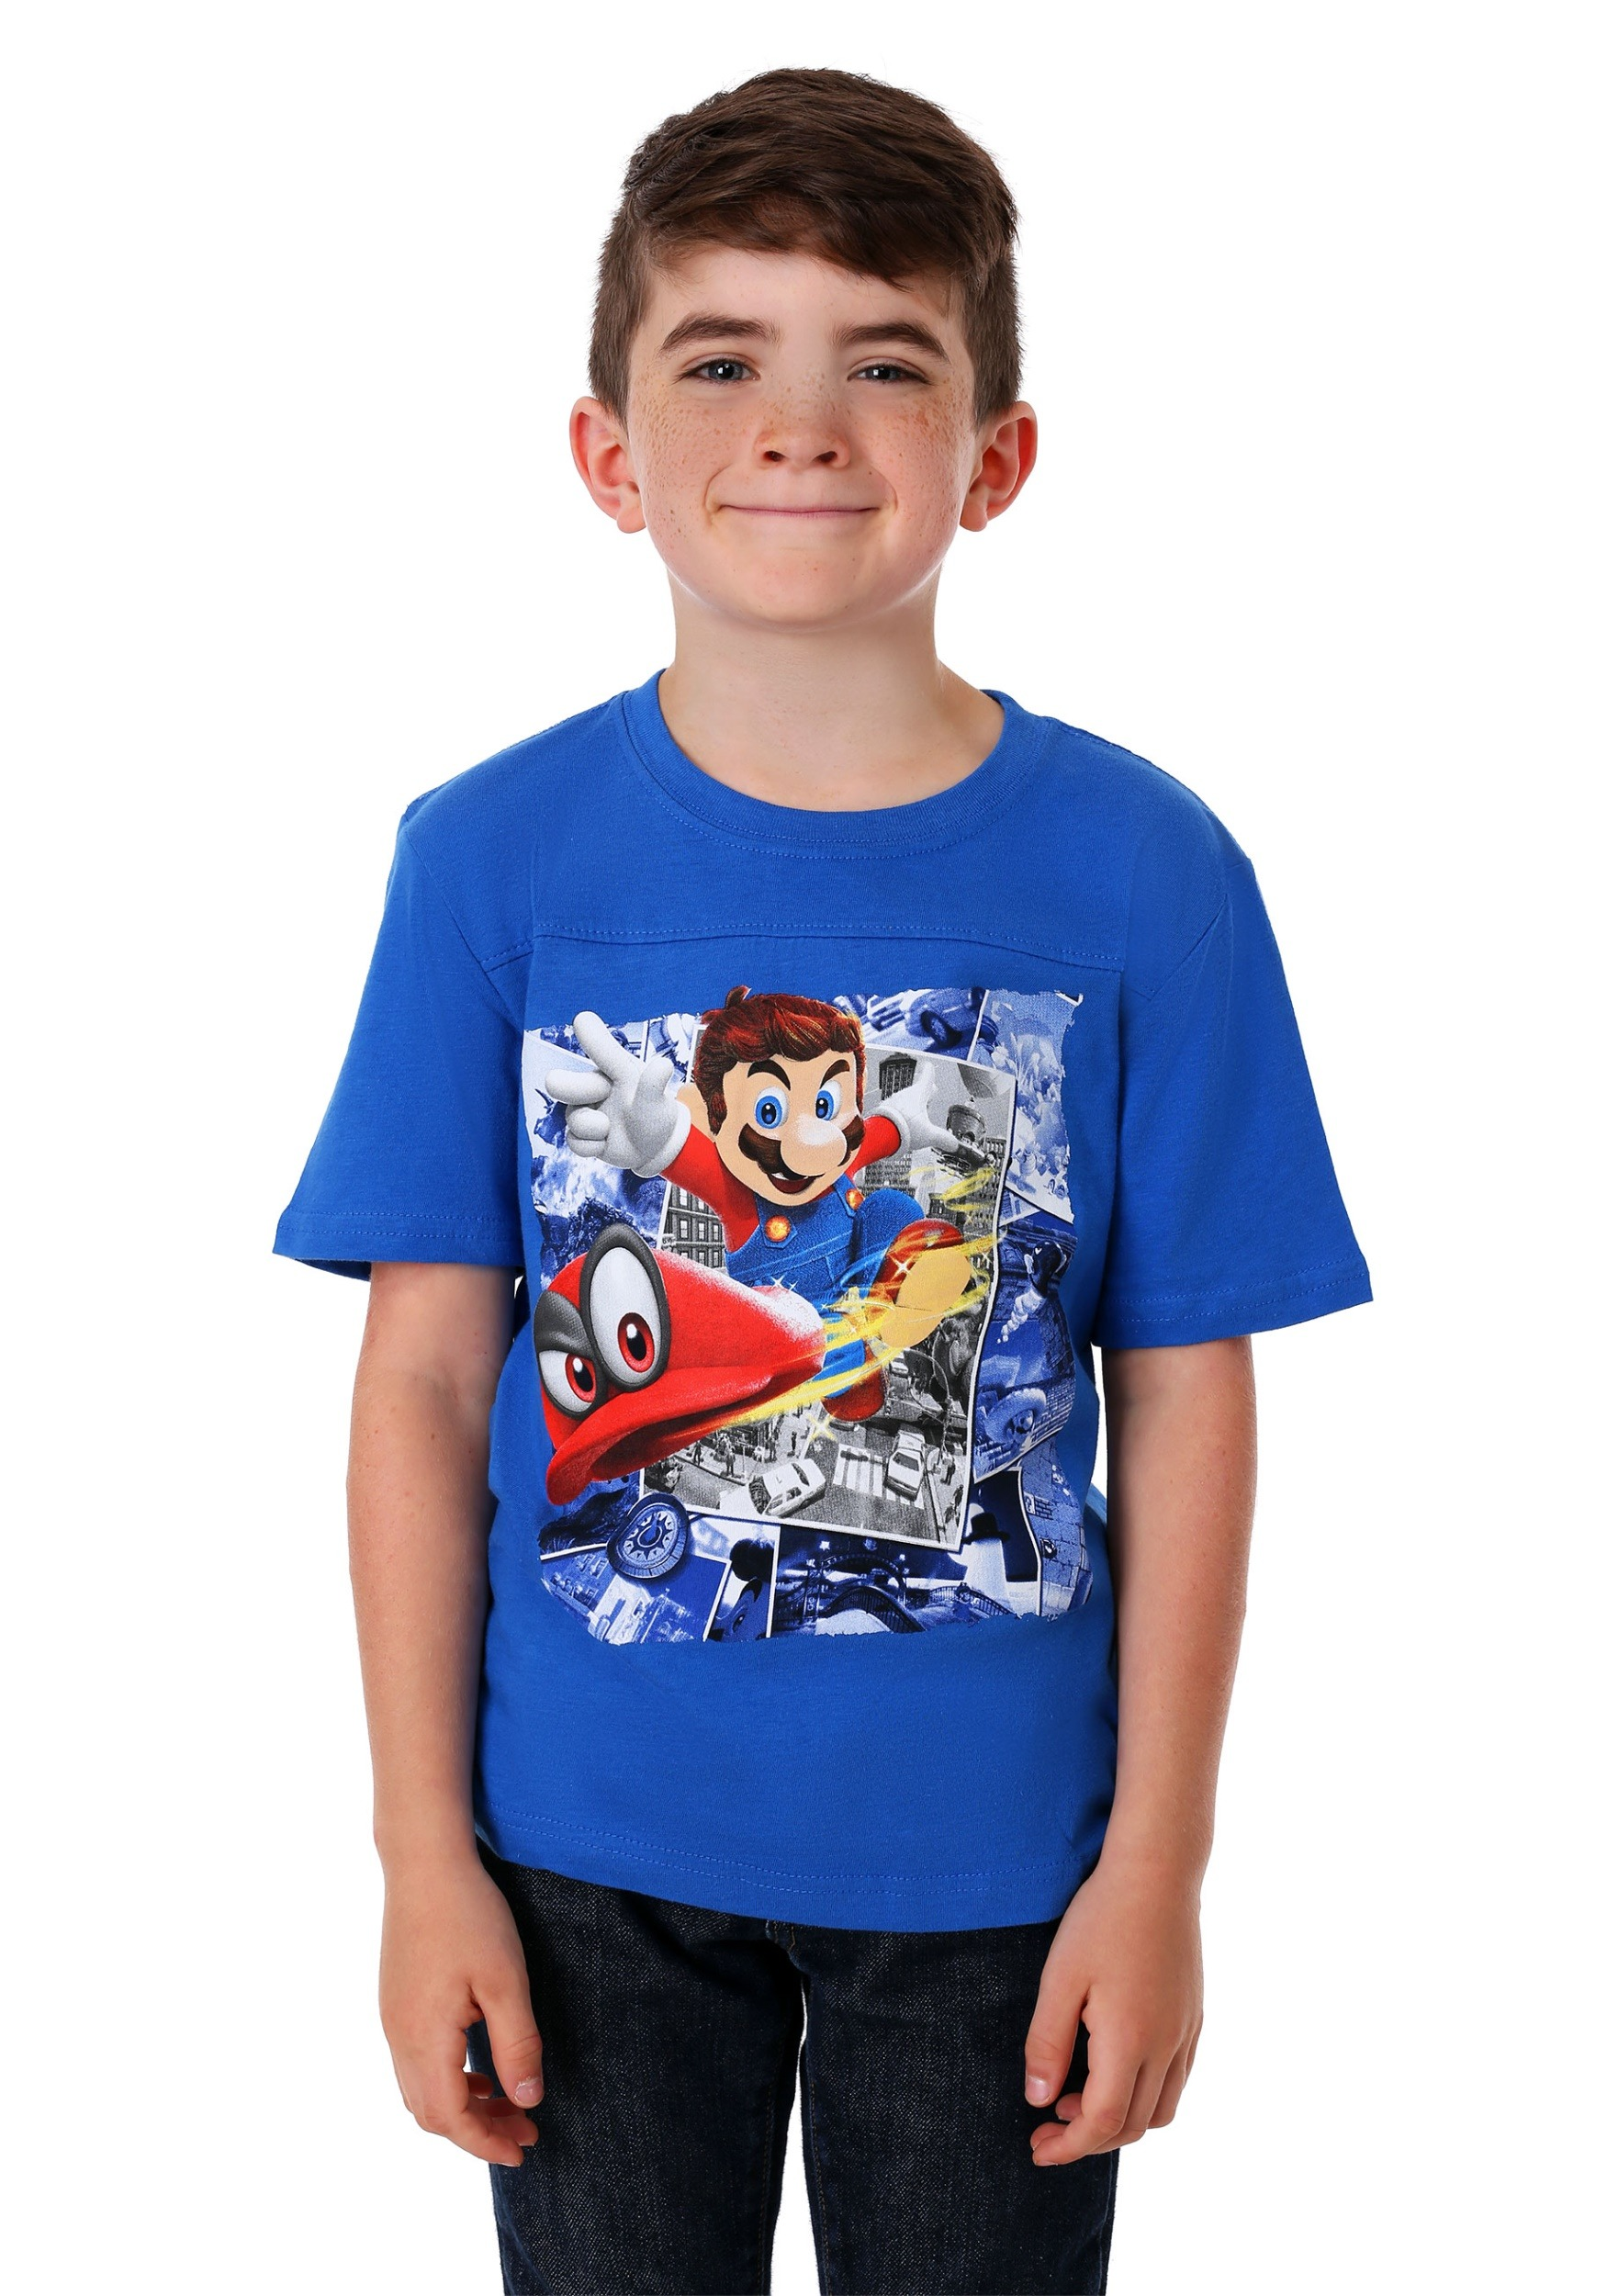 ecd77f7afaf Super Mario Odyssey Blue T-Shirt for Kids